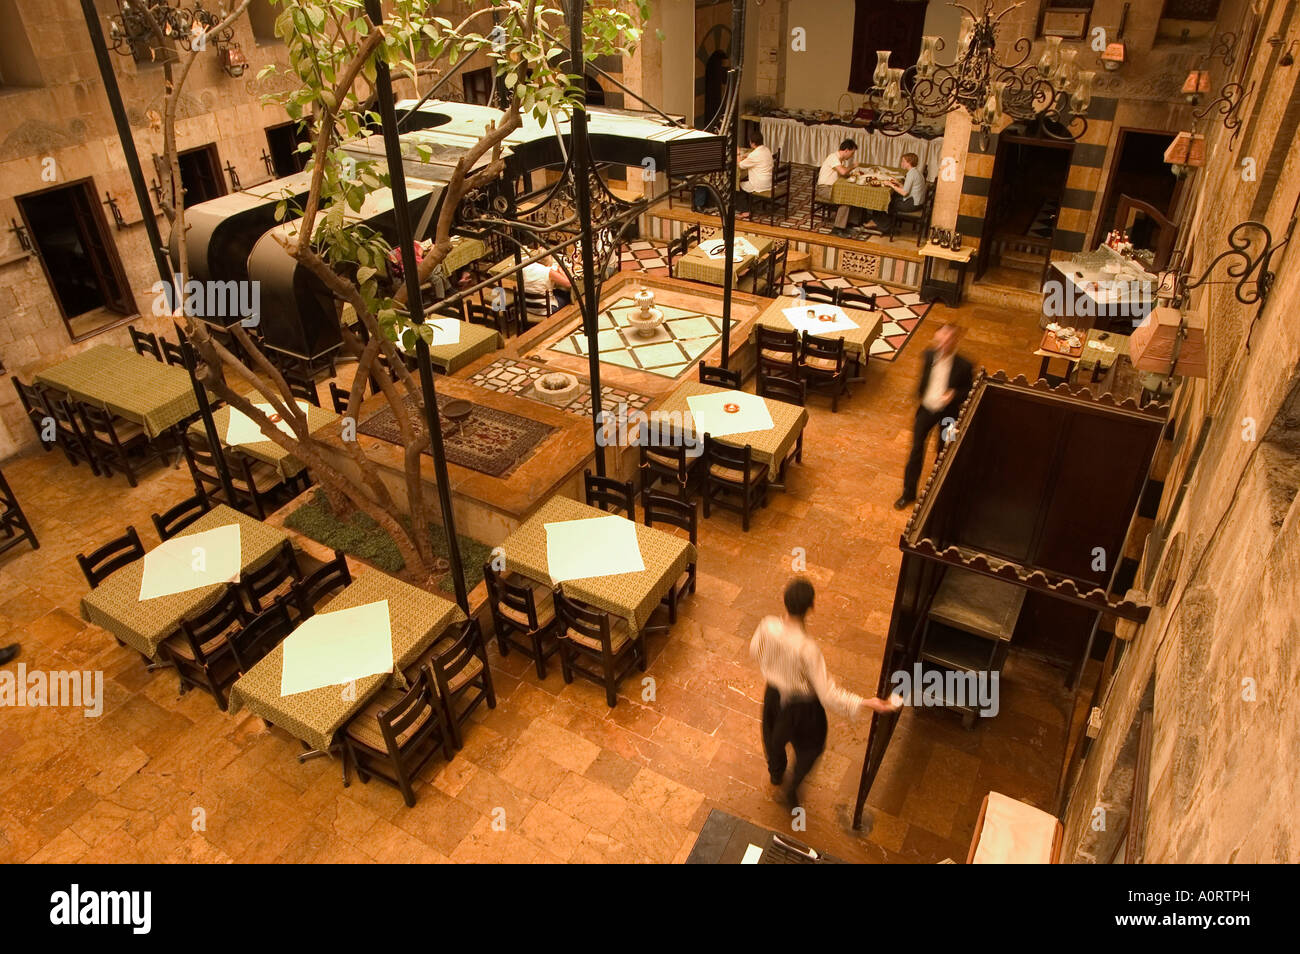 dining room beit al wakil hotel aleppo haleb syria middle east